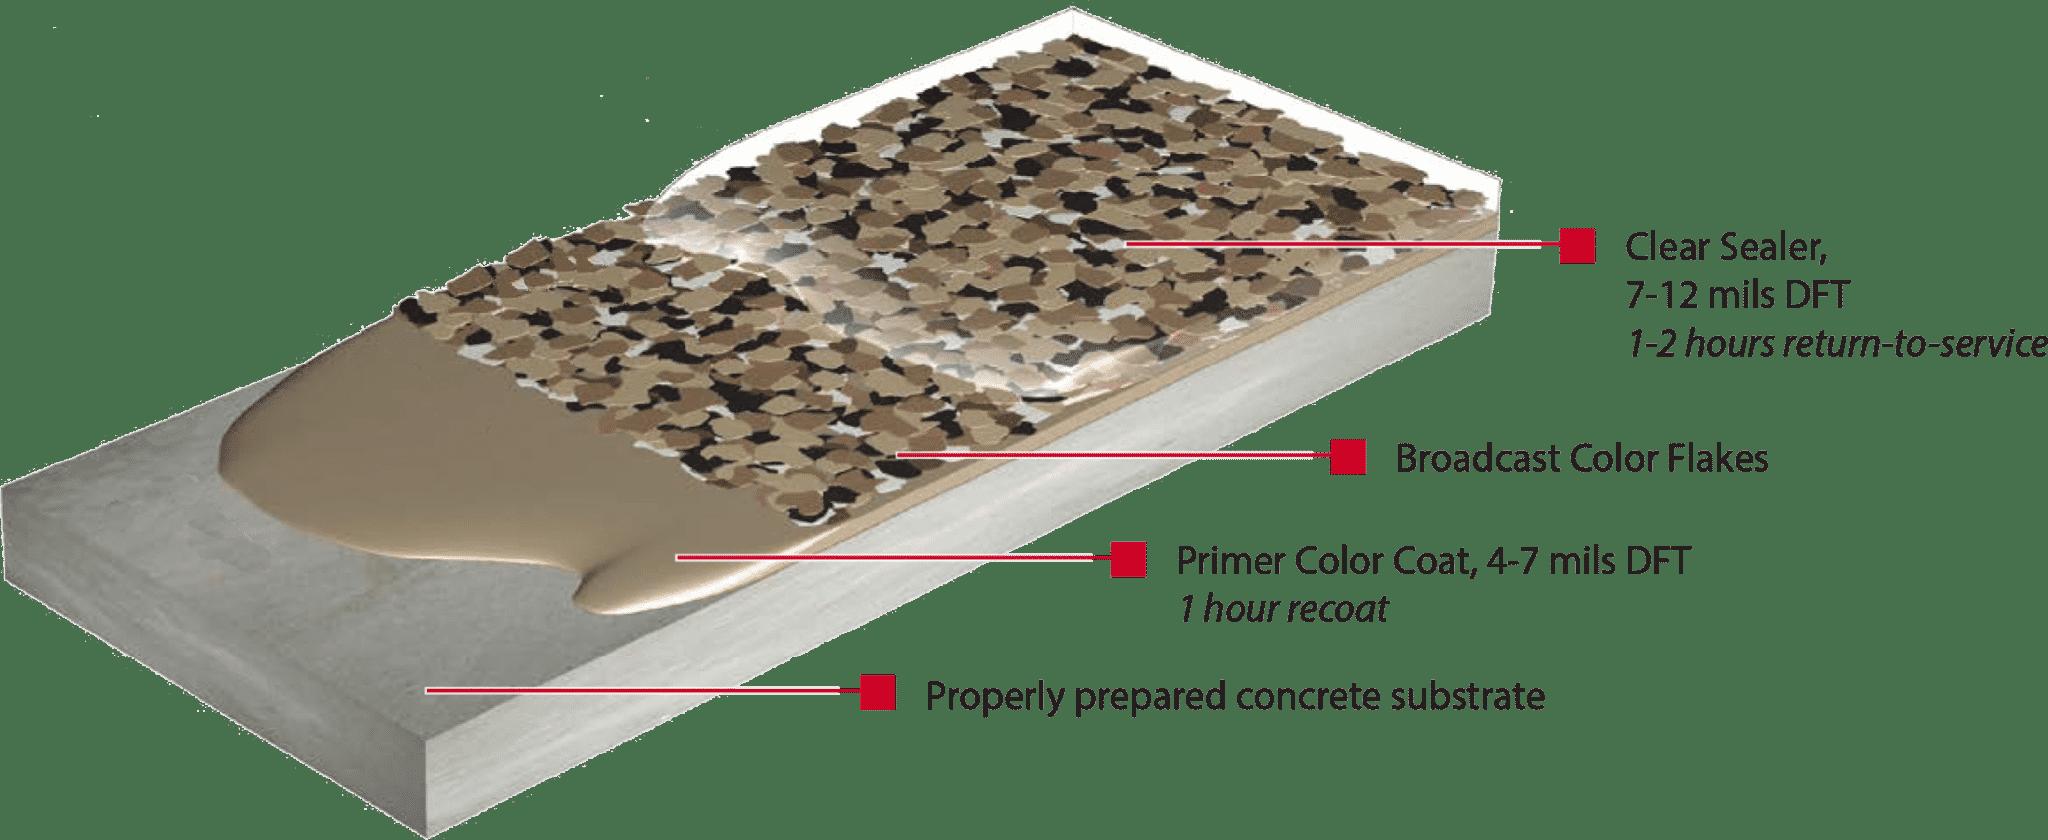 2 coat color flake system